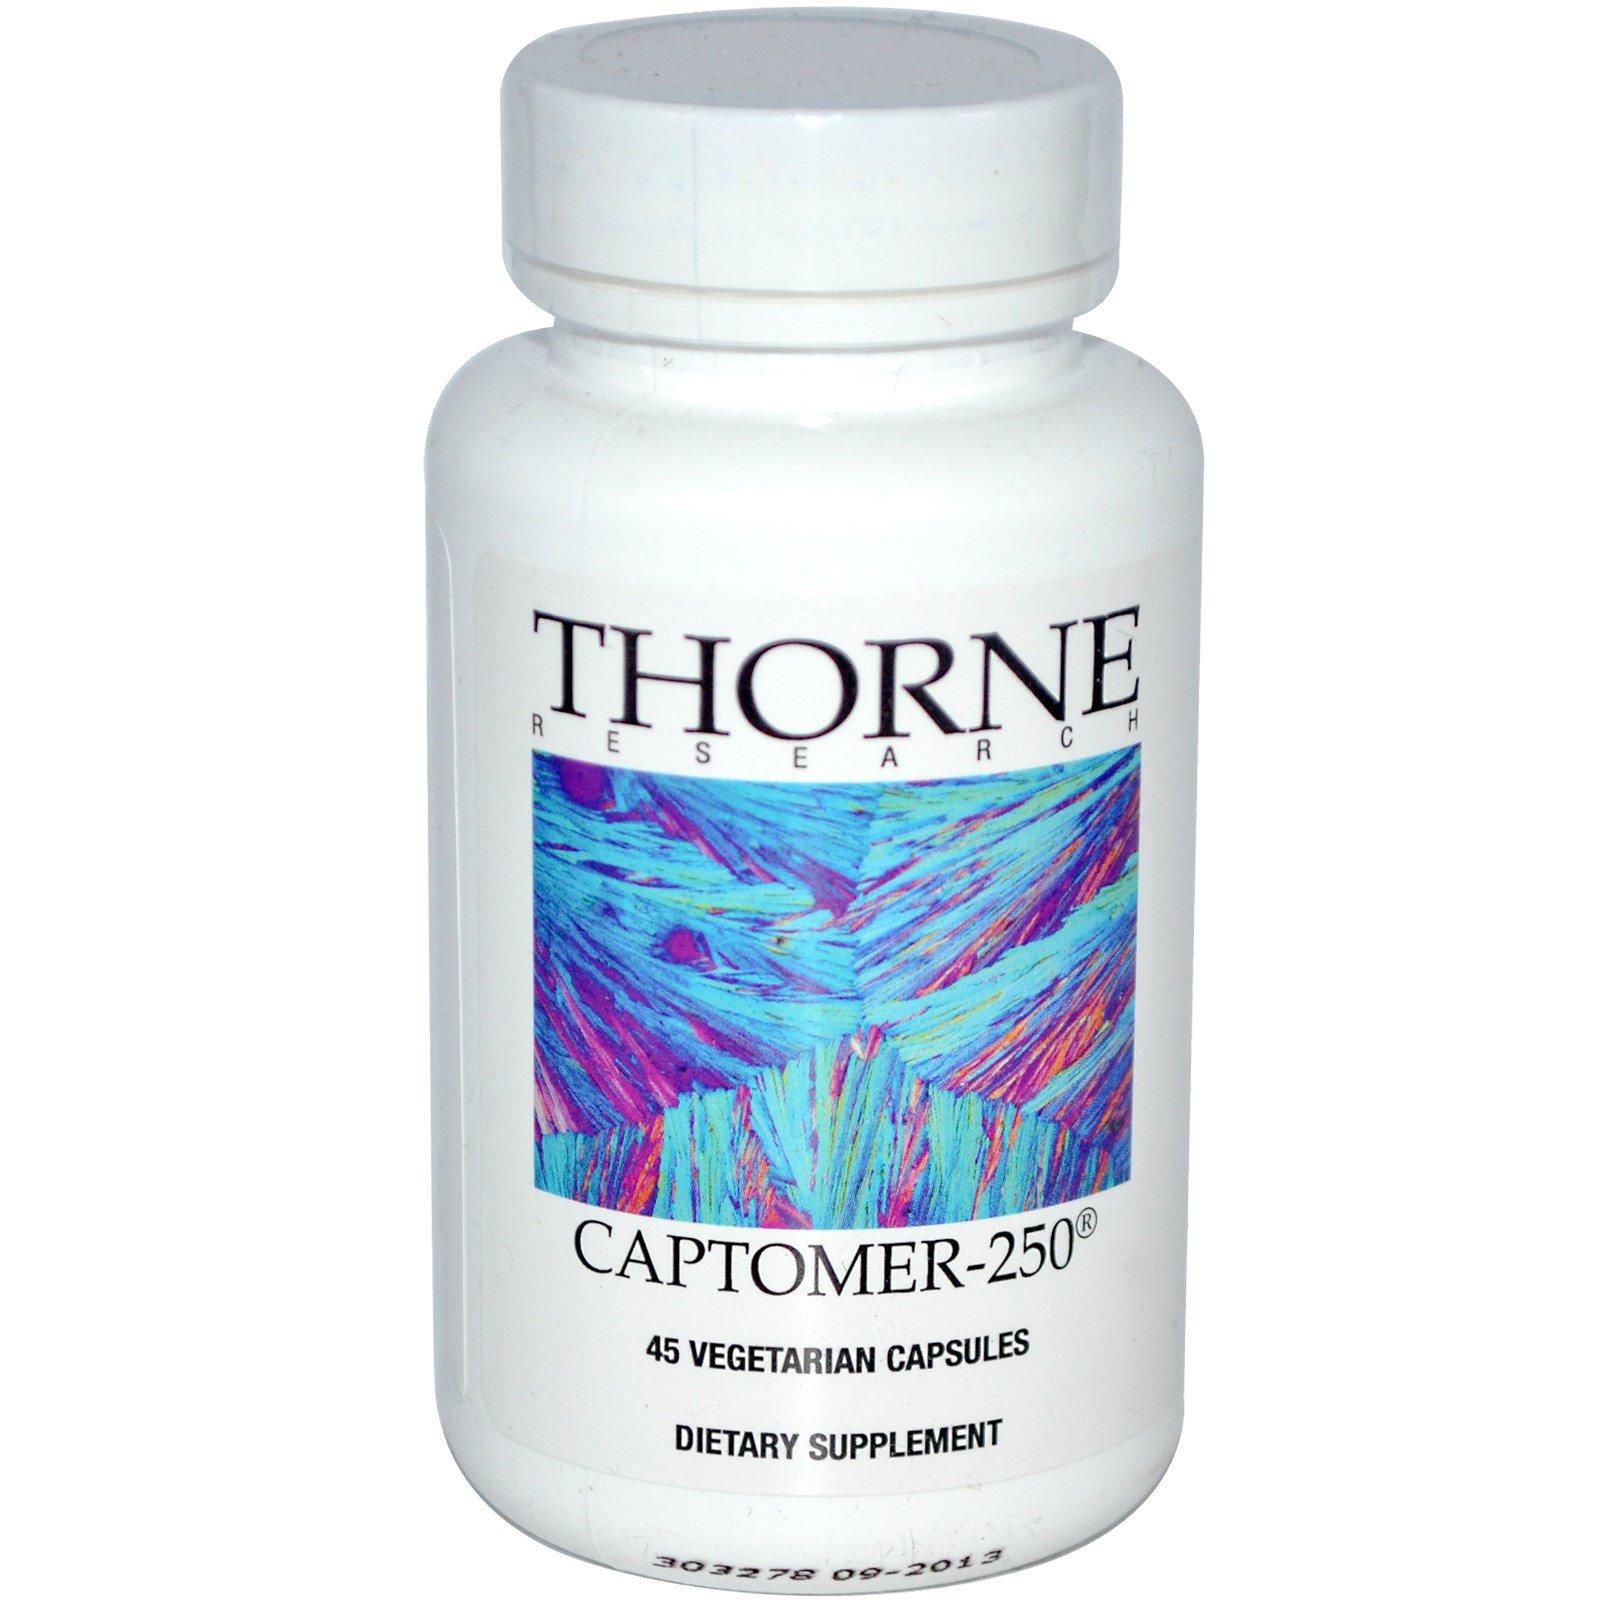 Thorne captomer